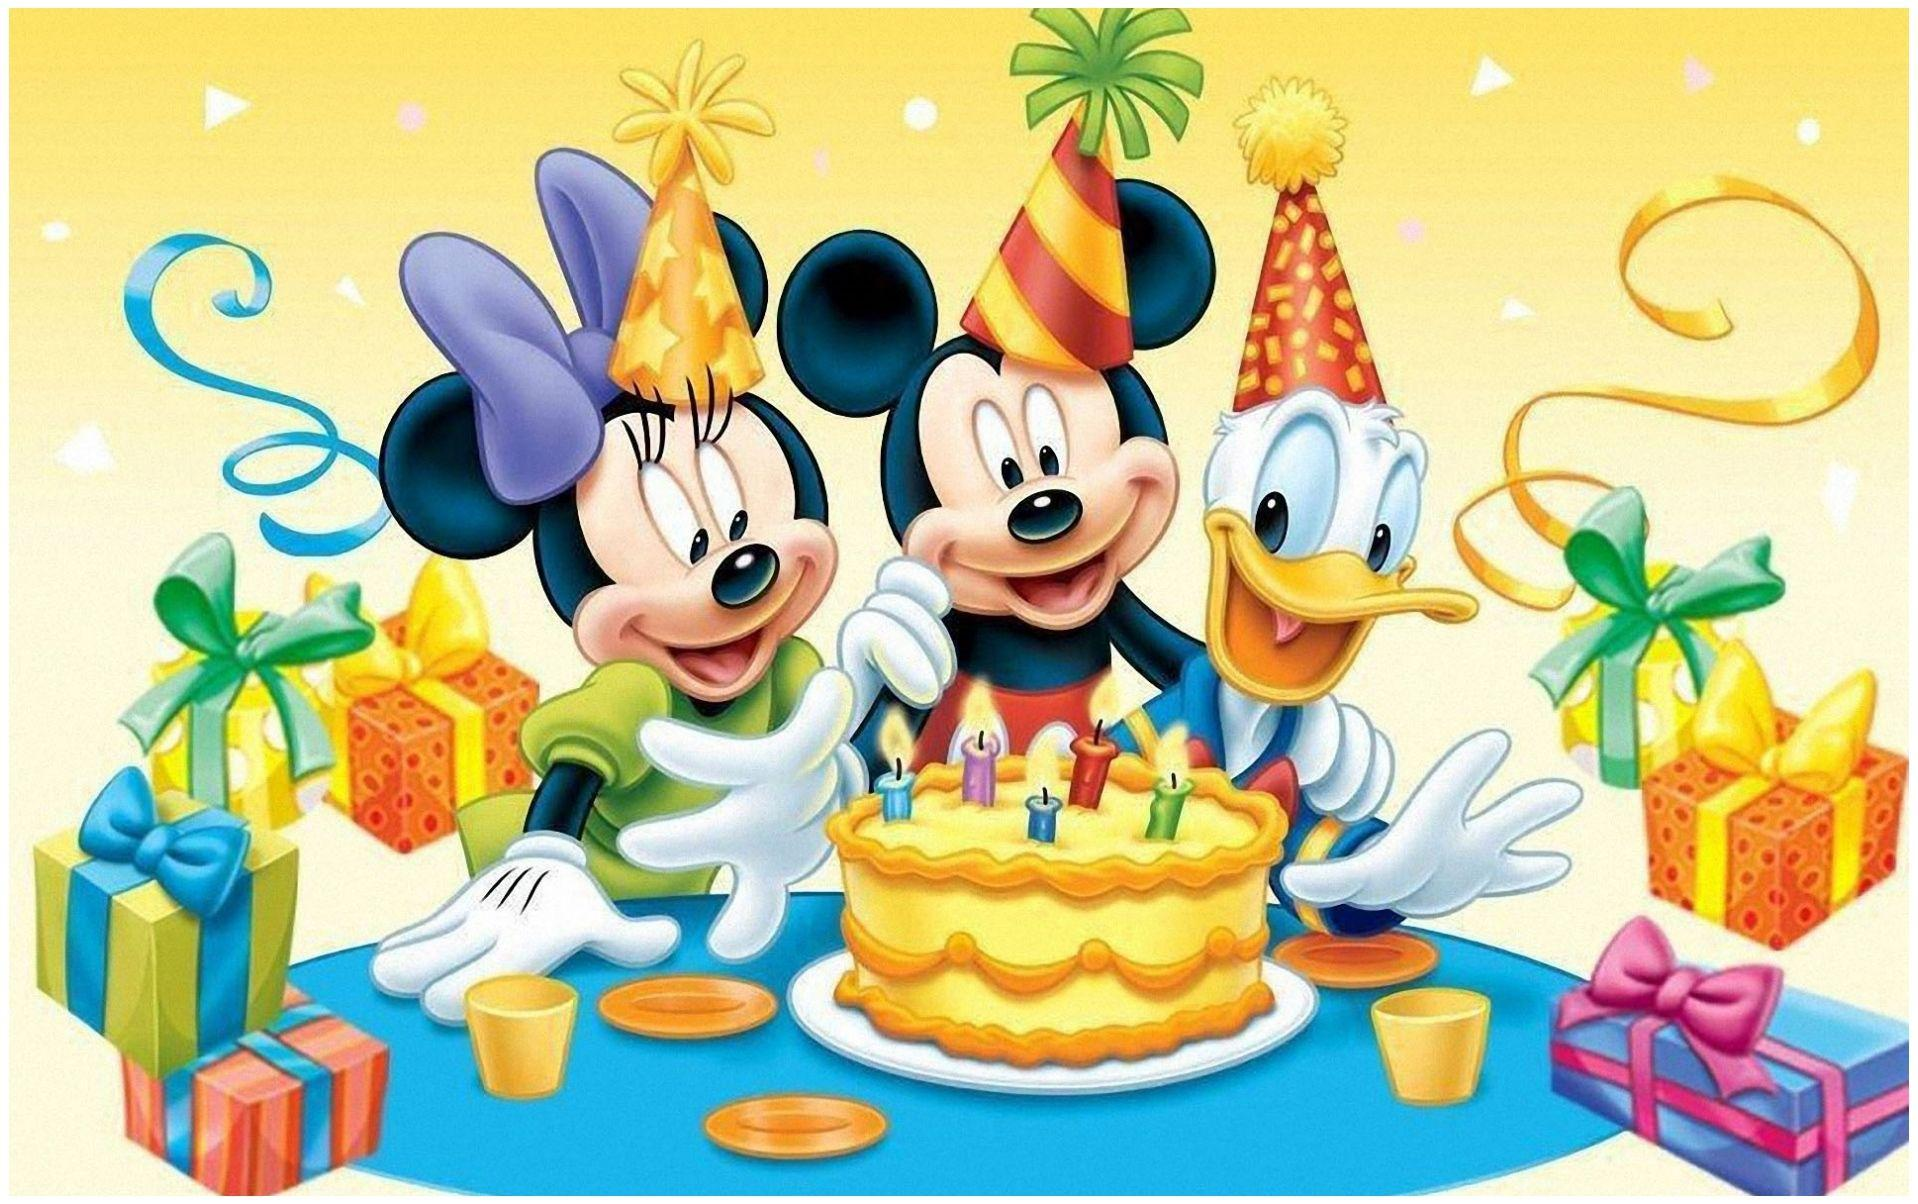 Disney Birthday Wallpapers - Top Free Disney Birthday Backgrounds -  WallpaperAccess